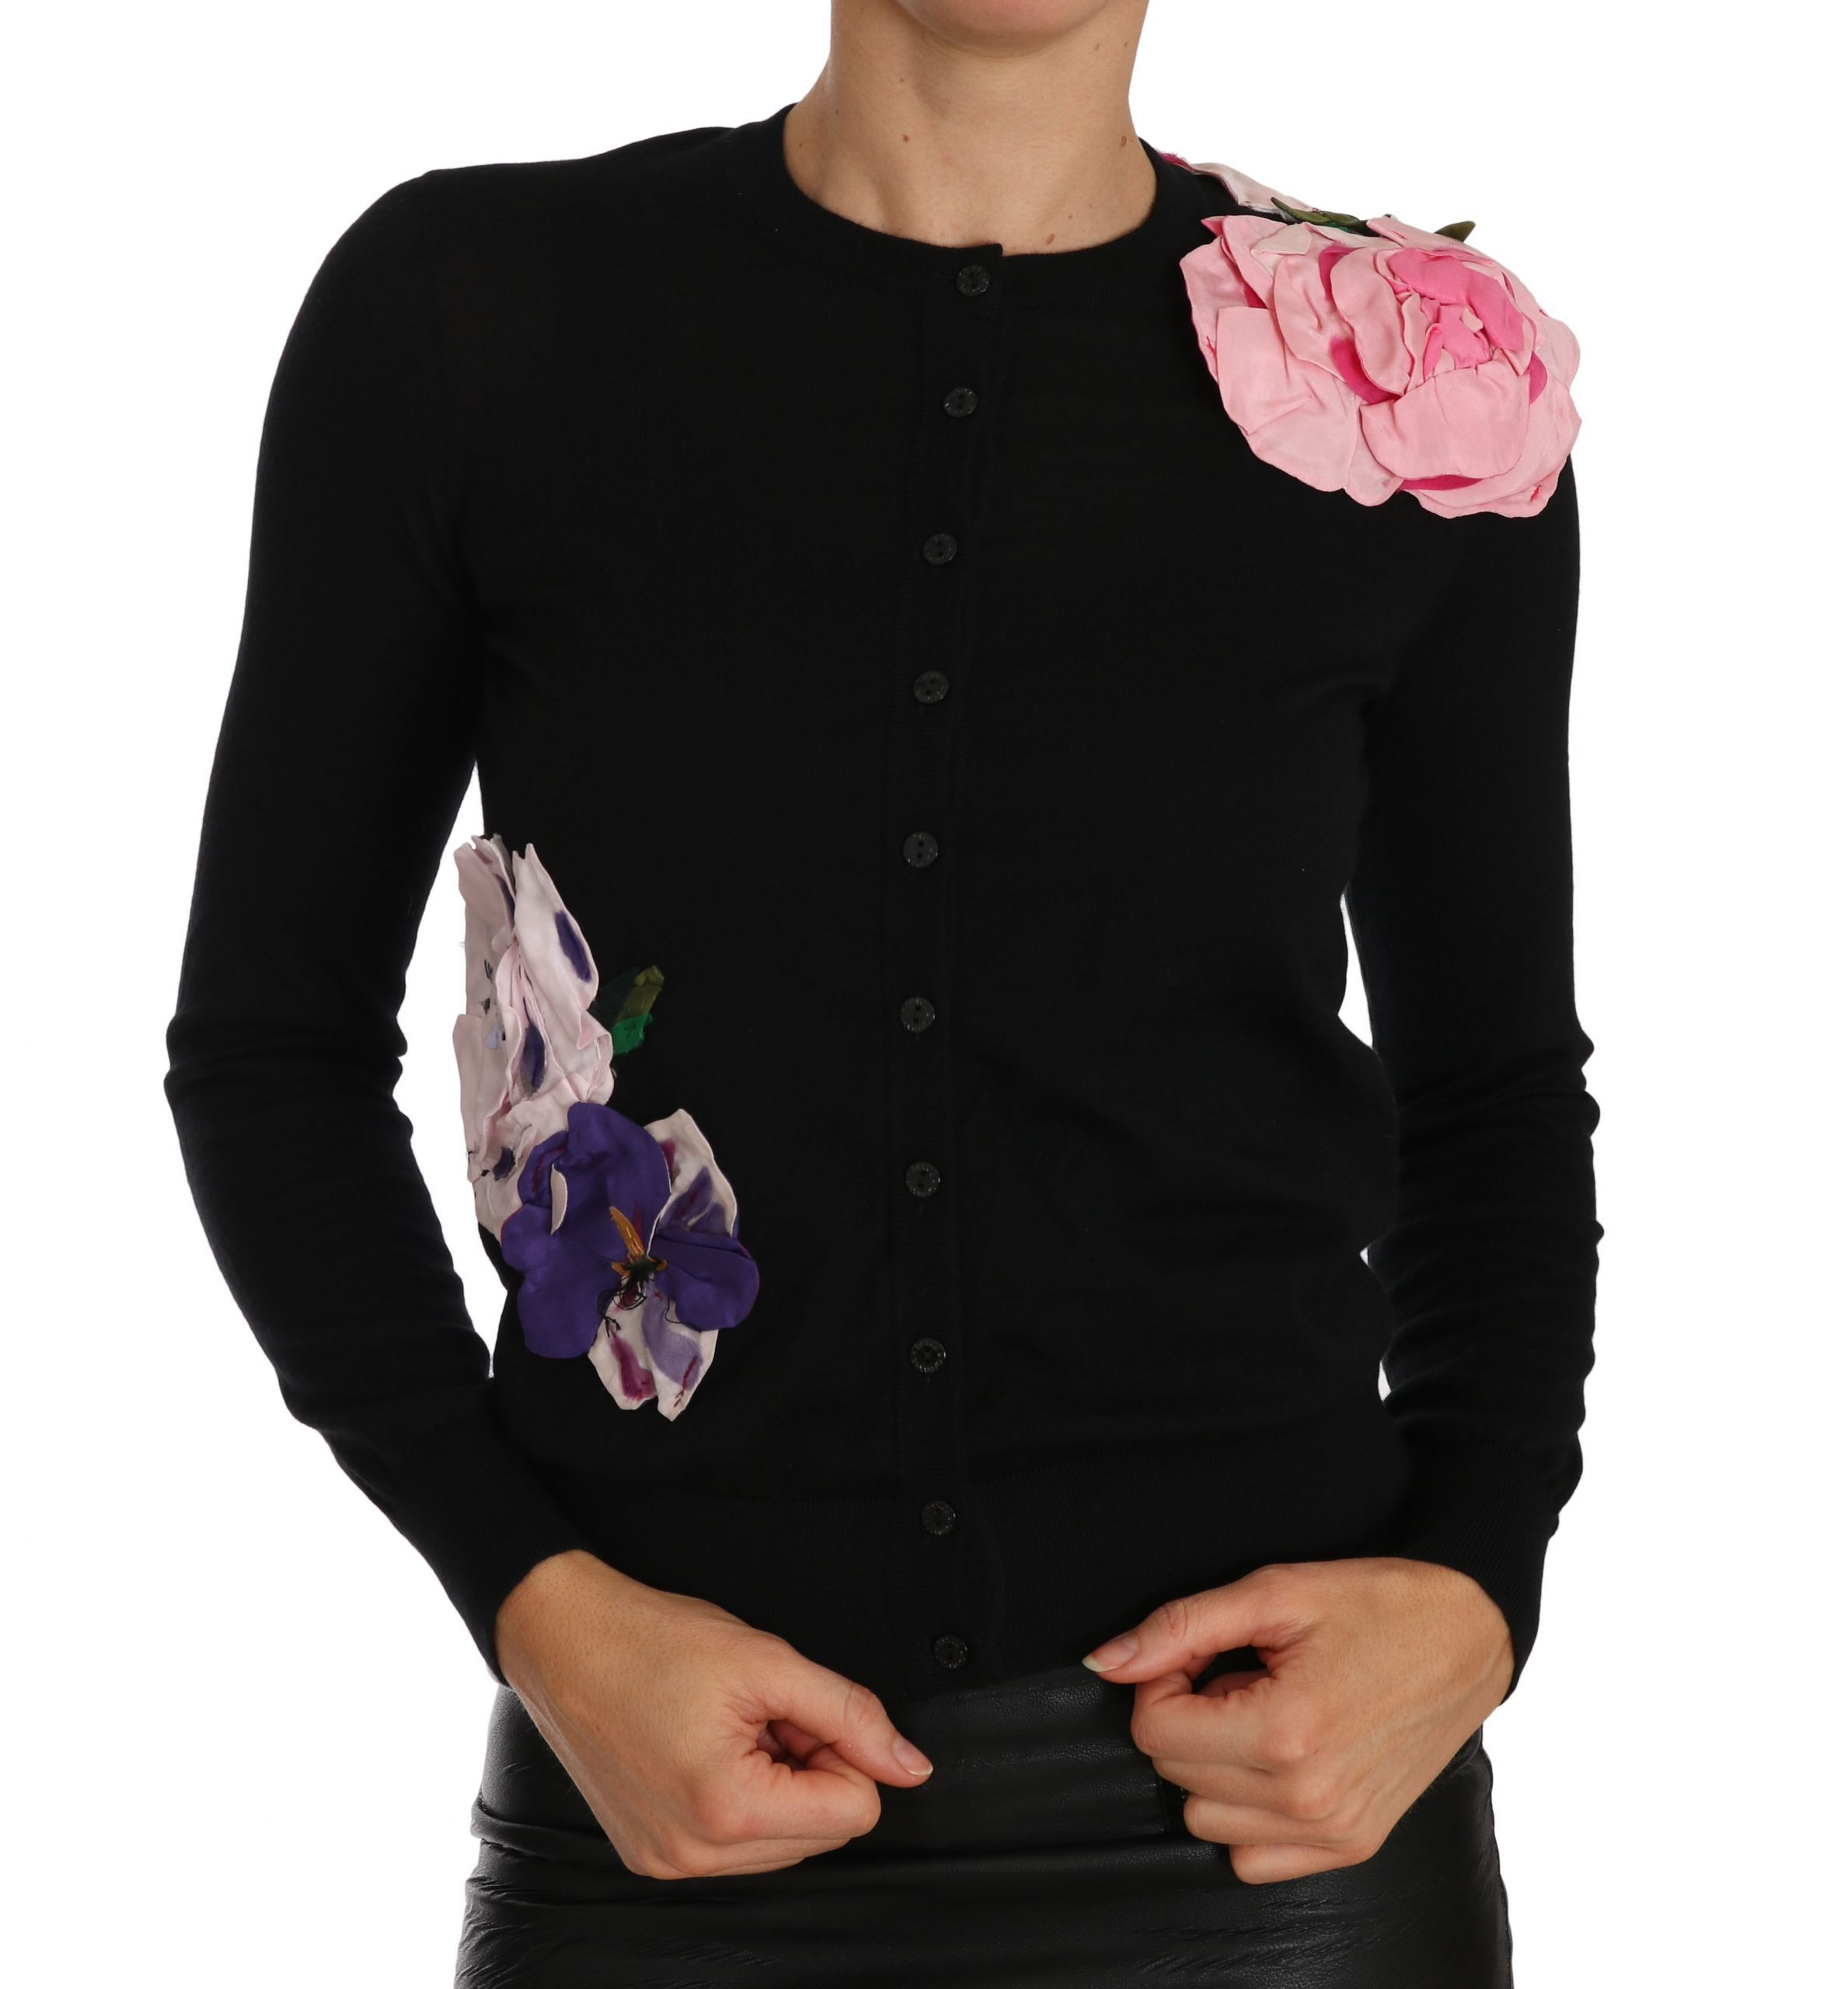 Dolce & Gabbana Women's Cashmere Floral Cardigan Black TSH2305 - IT36 XXS